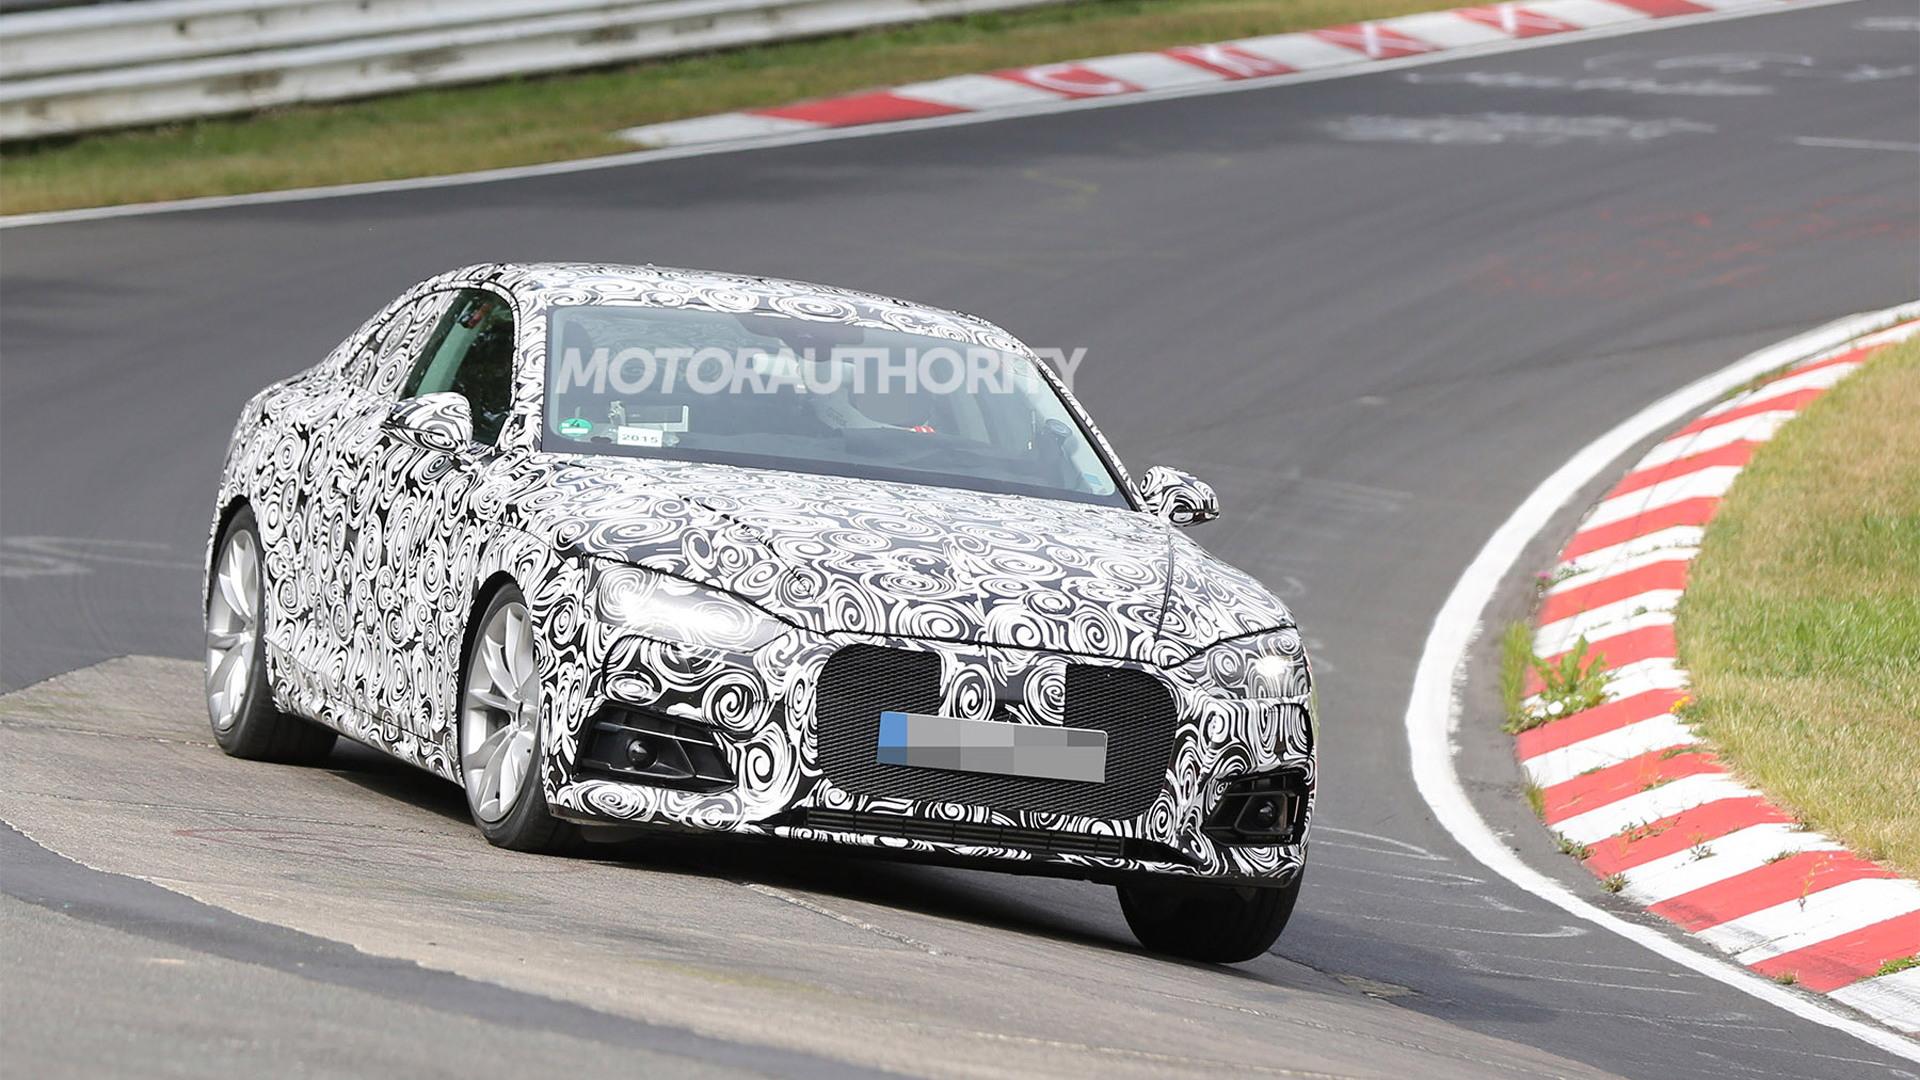 2018 Audi S5 spy shots - Image via S. Baldauf/SB-Medien